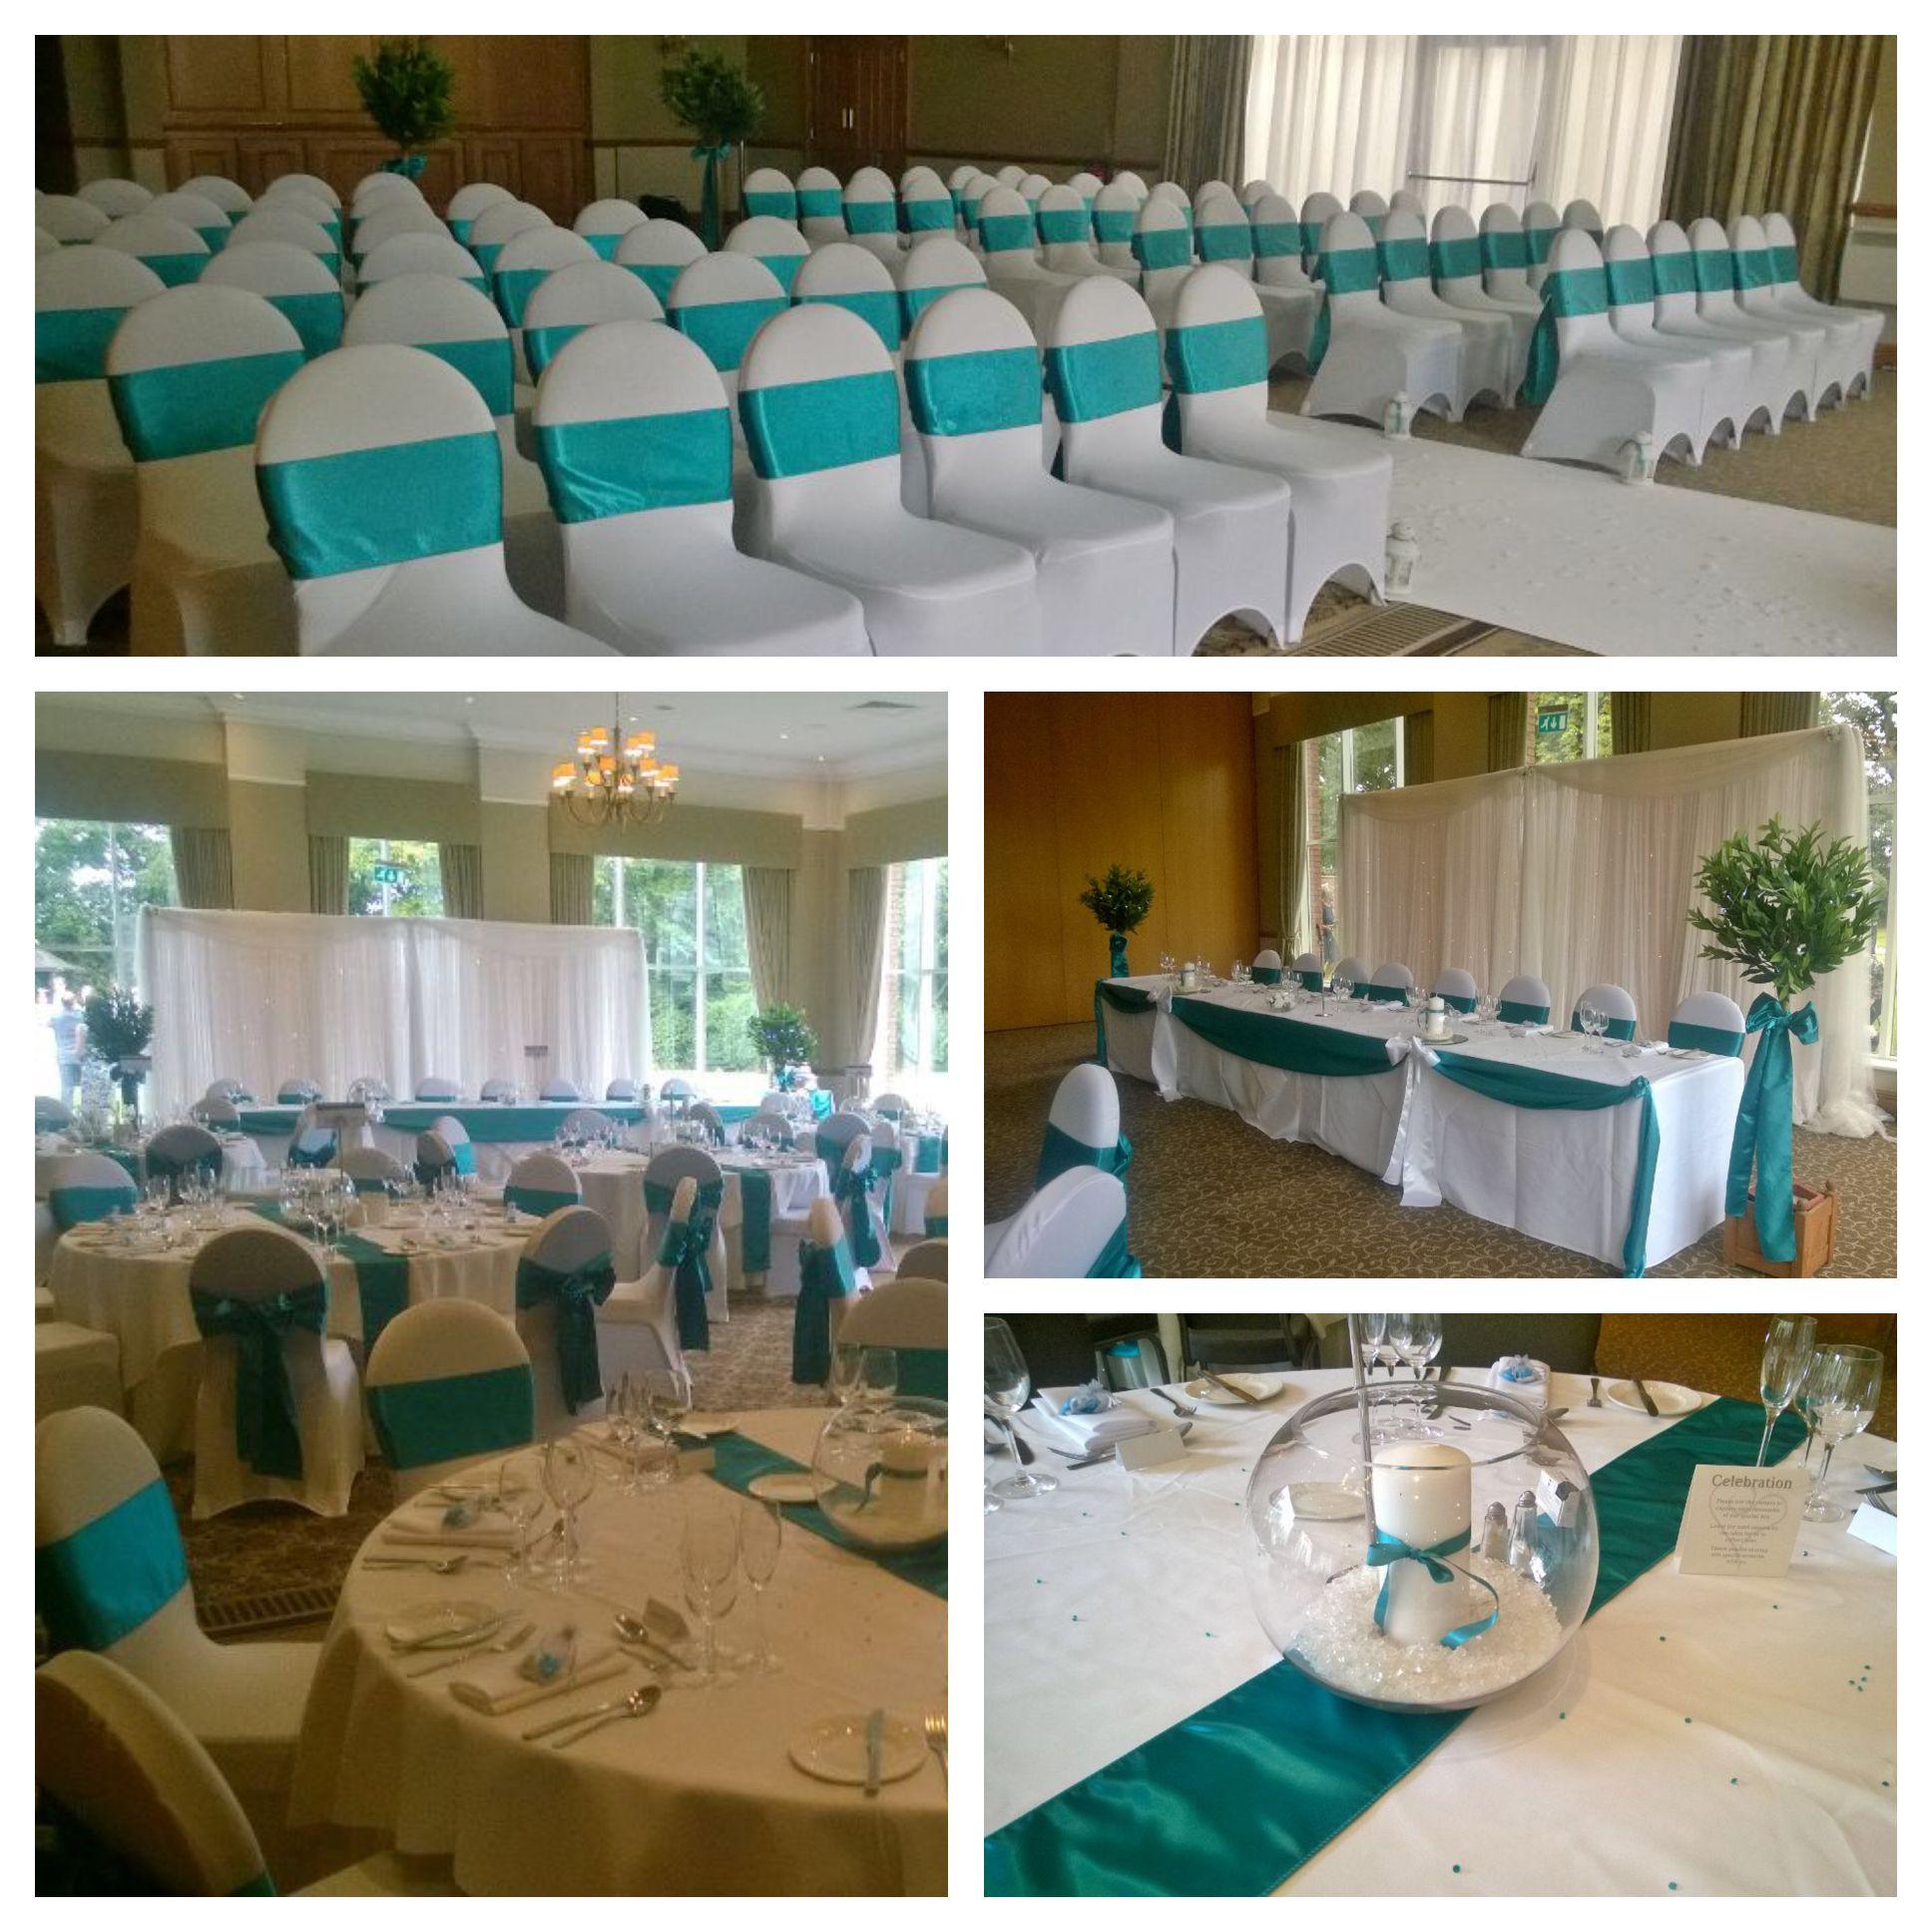 A beautiful turquoise wedding